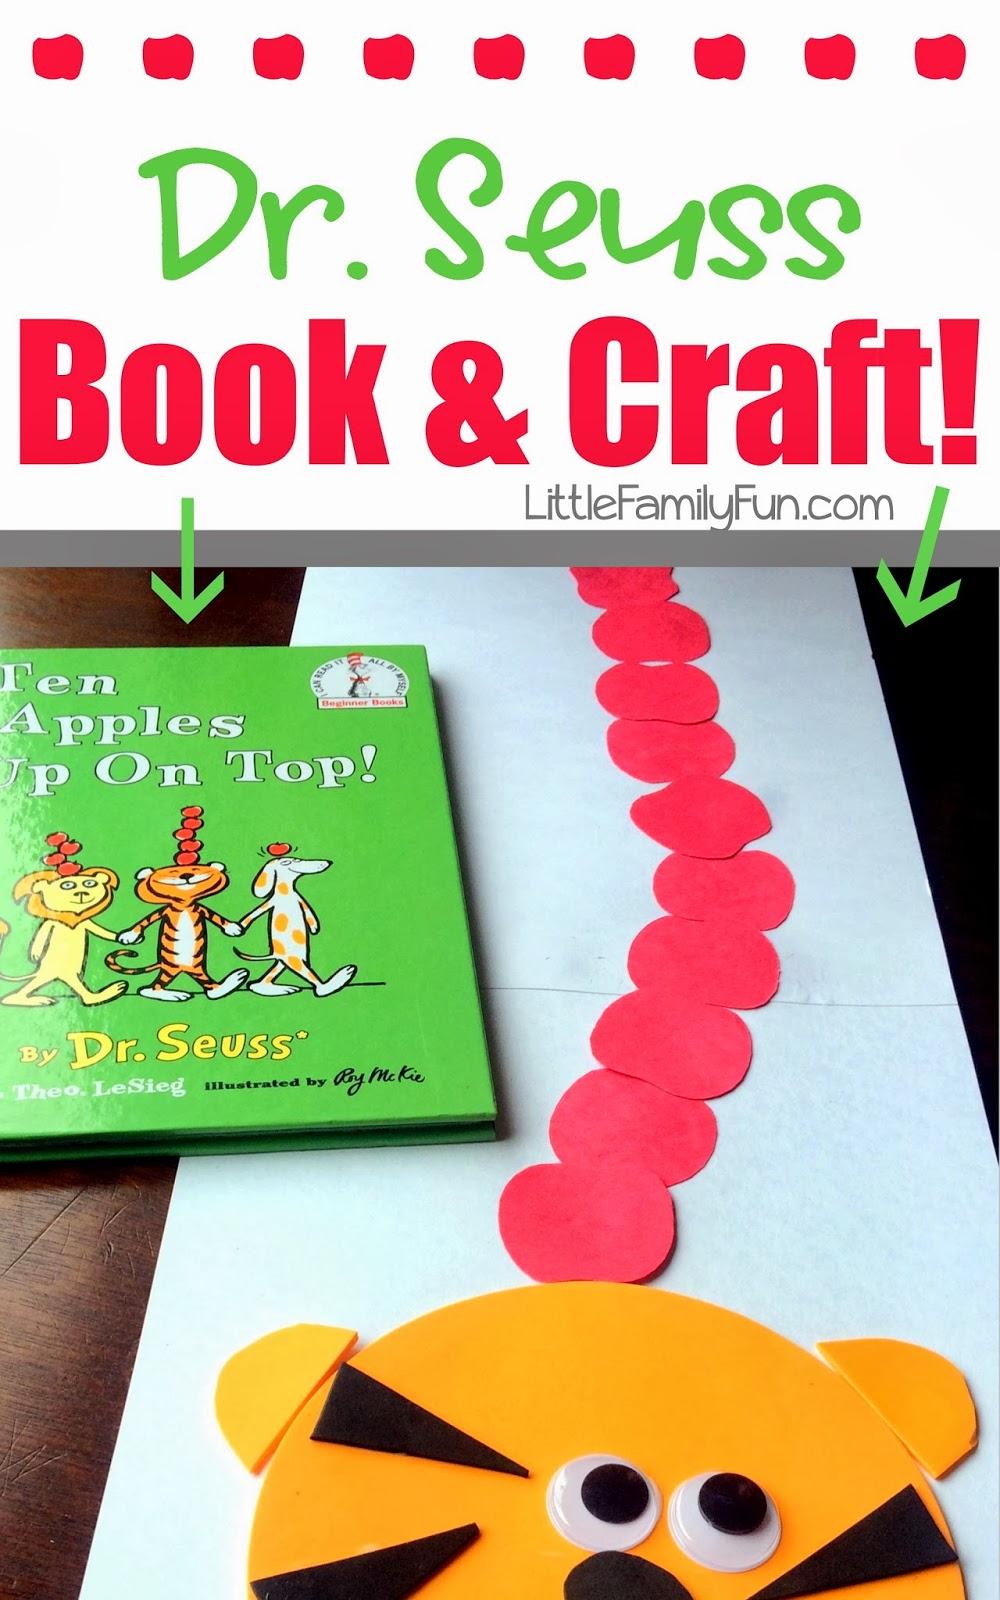 Ten apples up on top craft dr seuss book craft for Dr seuss crafts for preschool